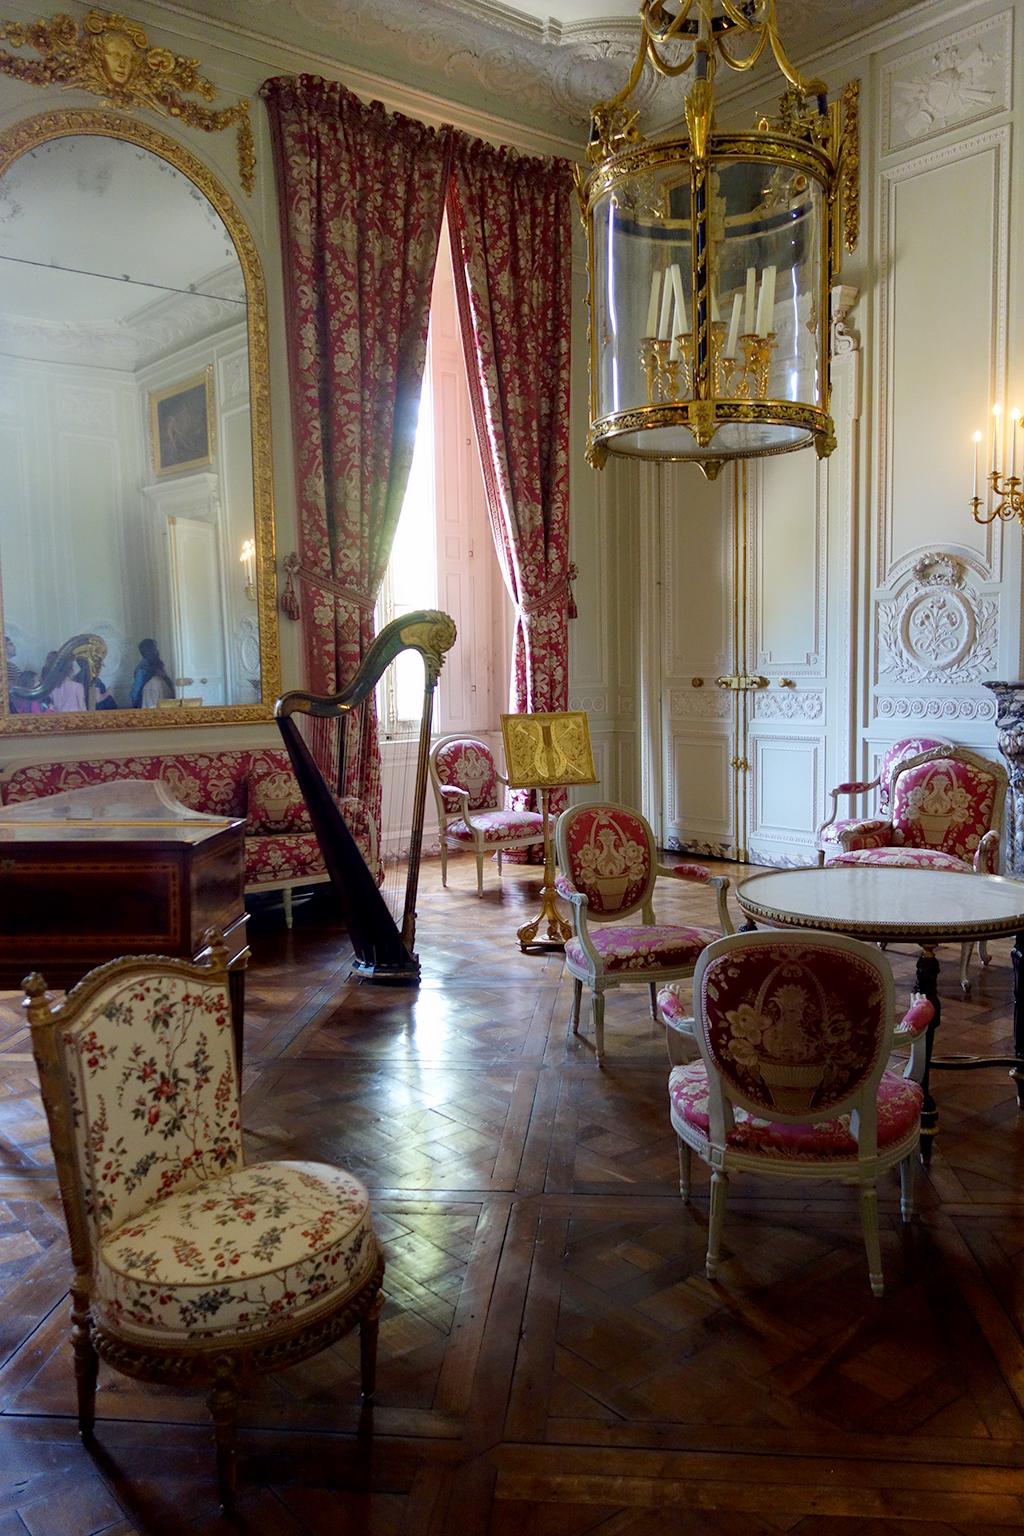 Harp in Antoinette's Parlor